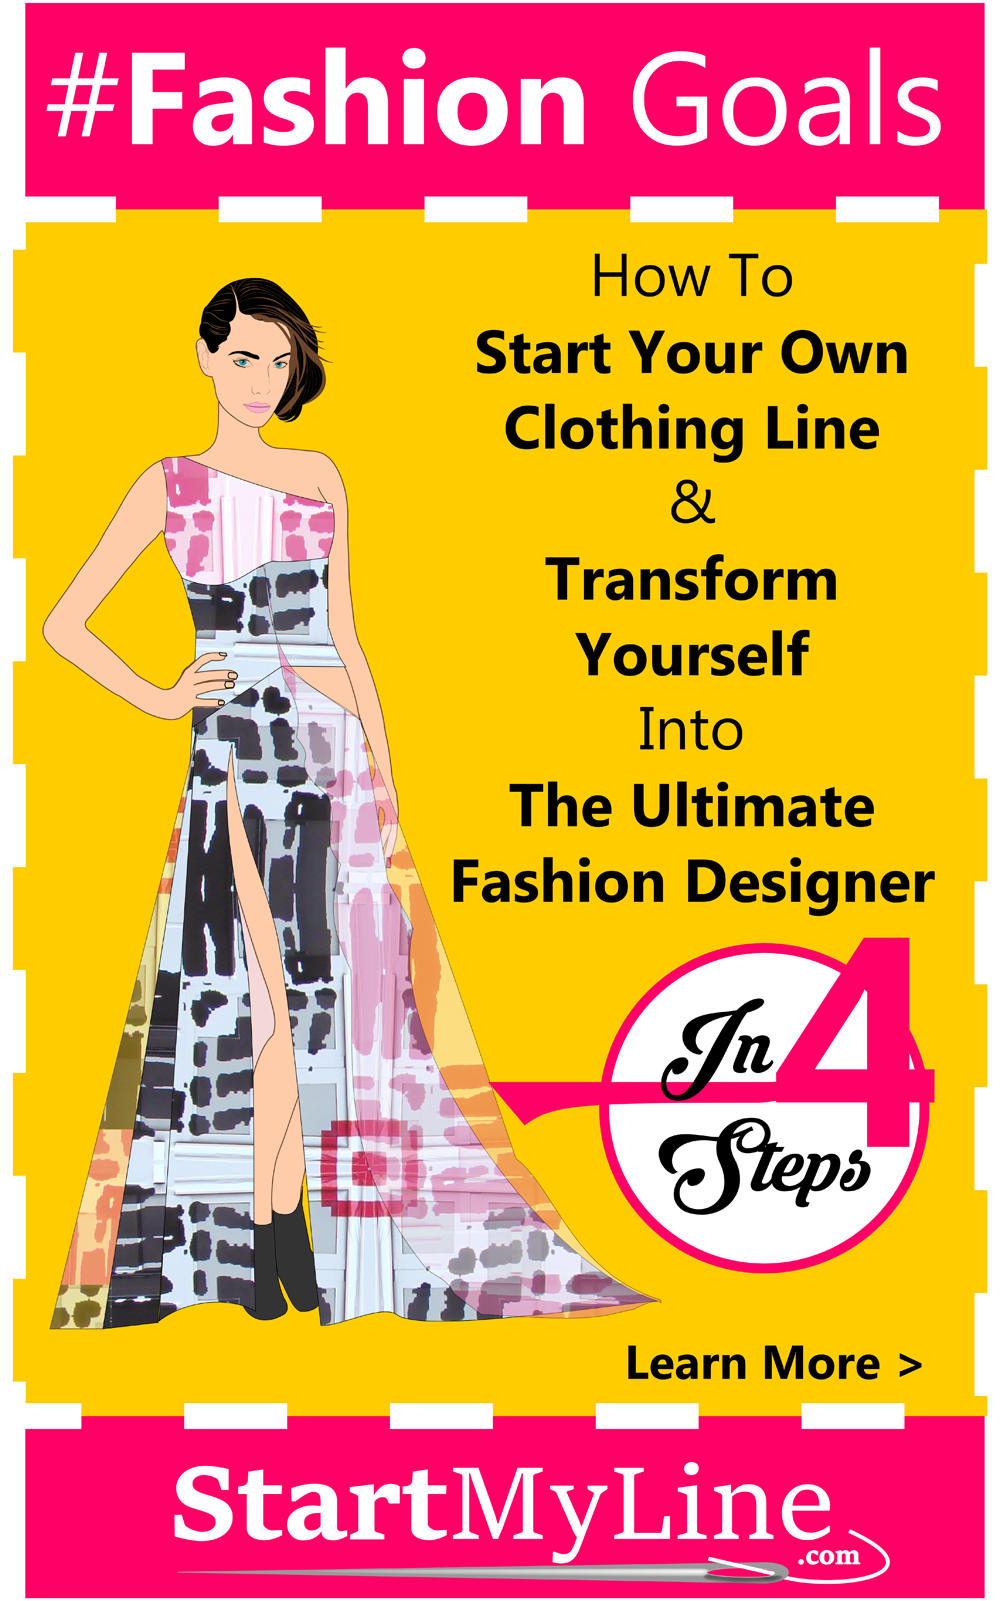 Design your own fashion line game Fashion Designer - Free online games at m